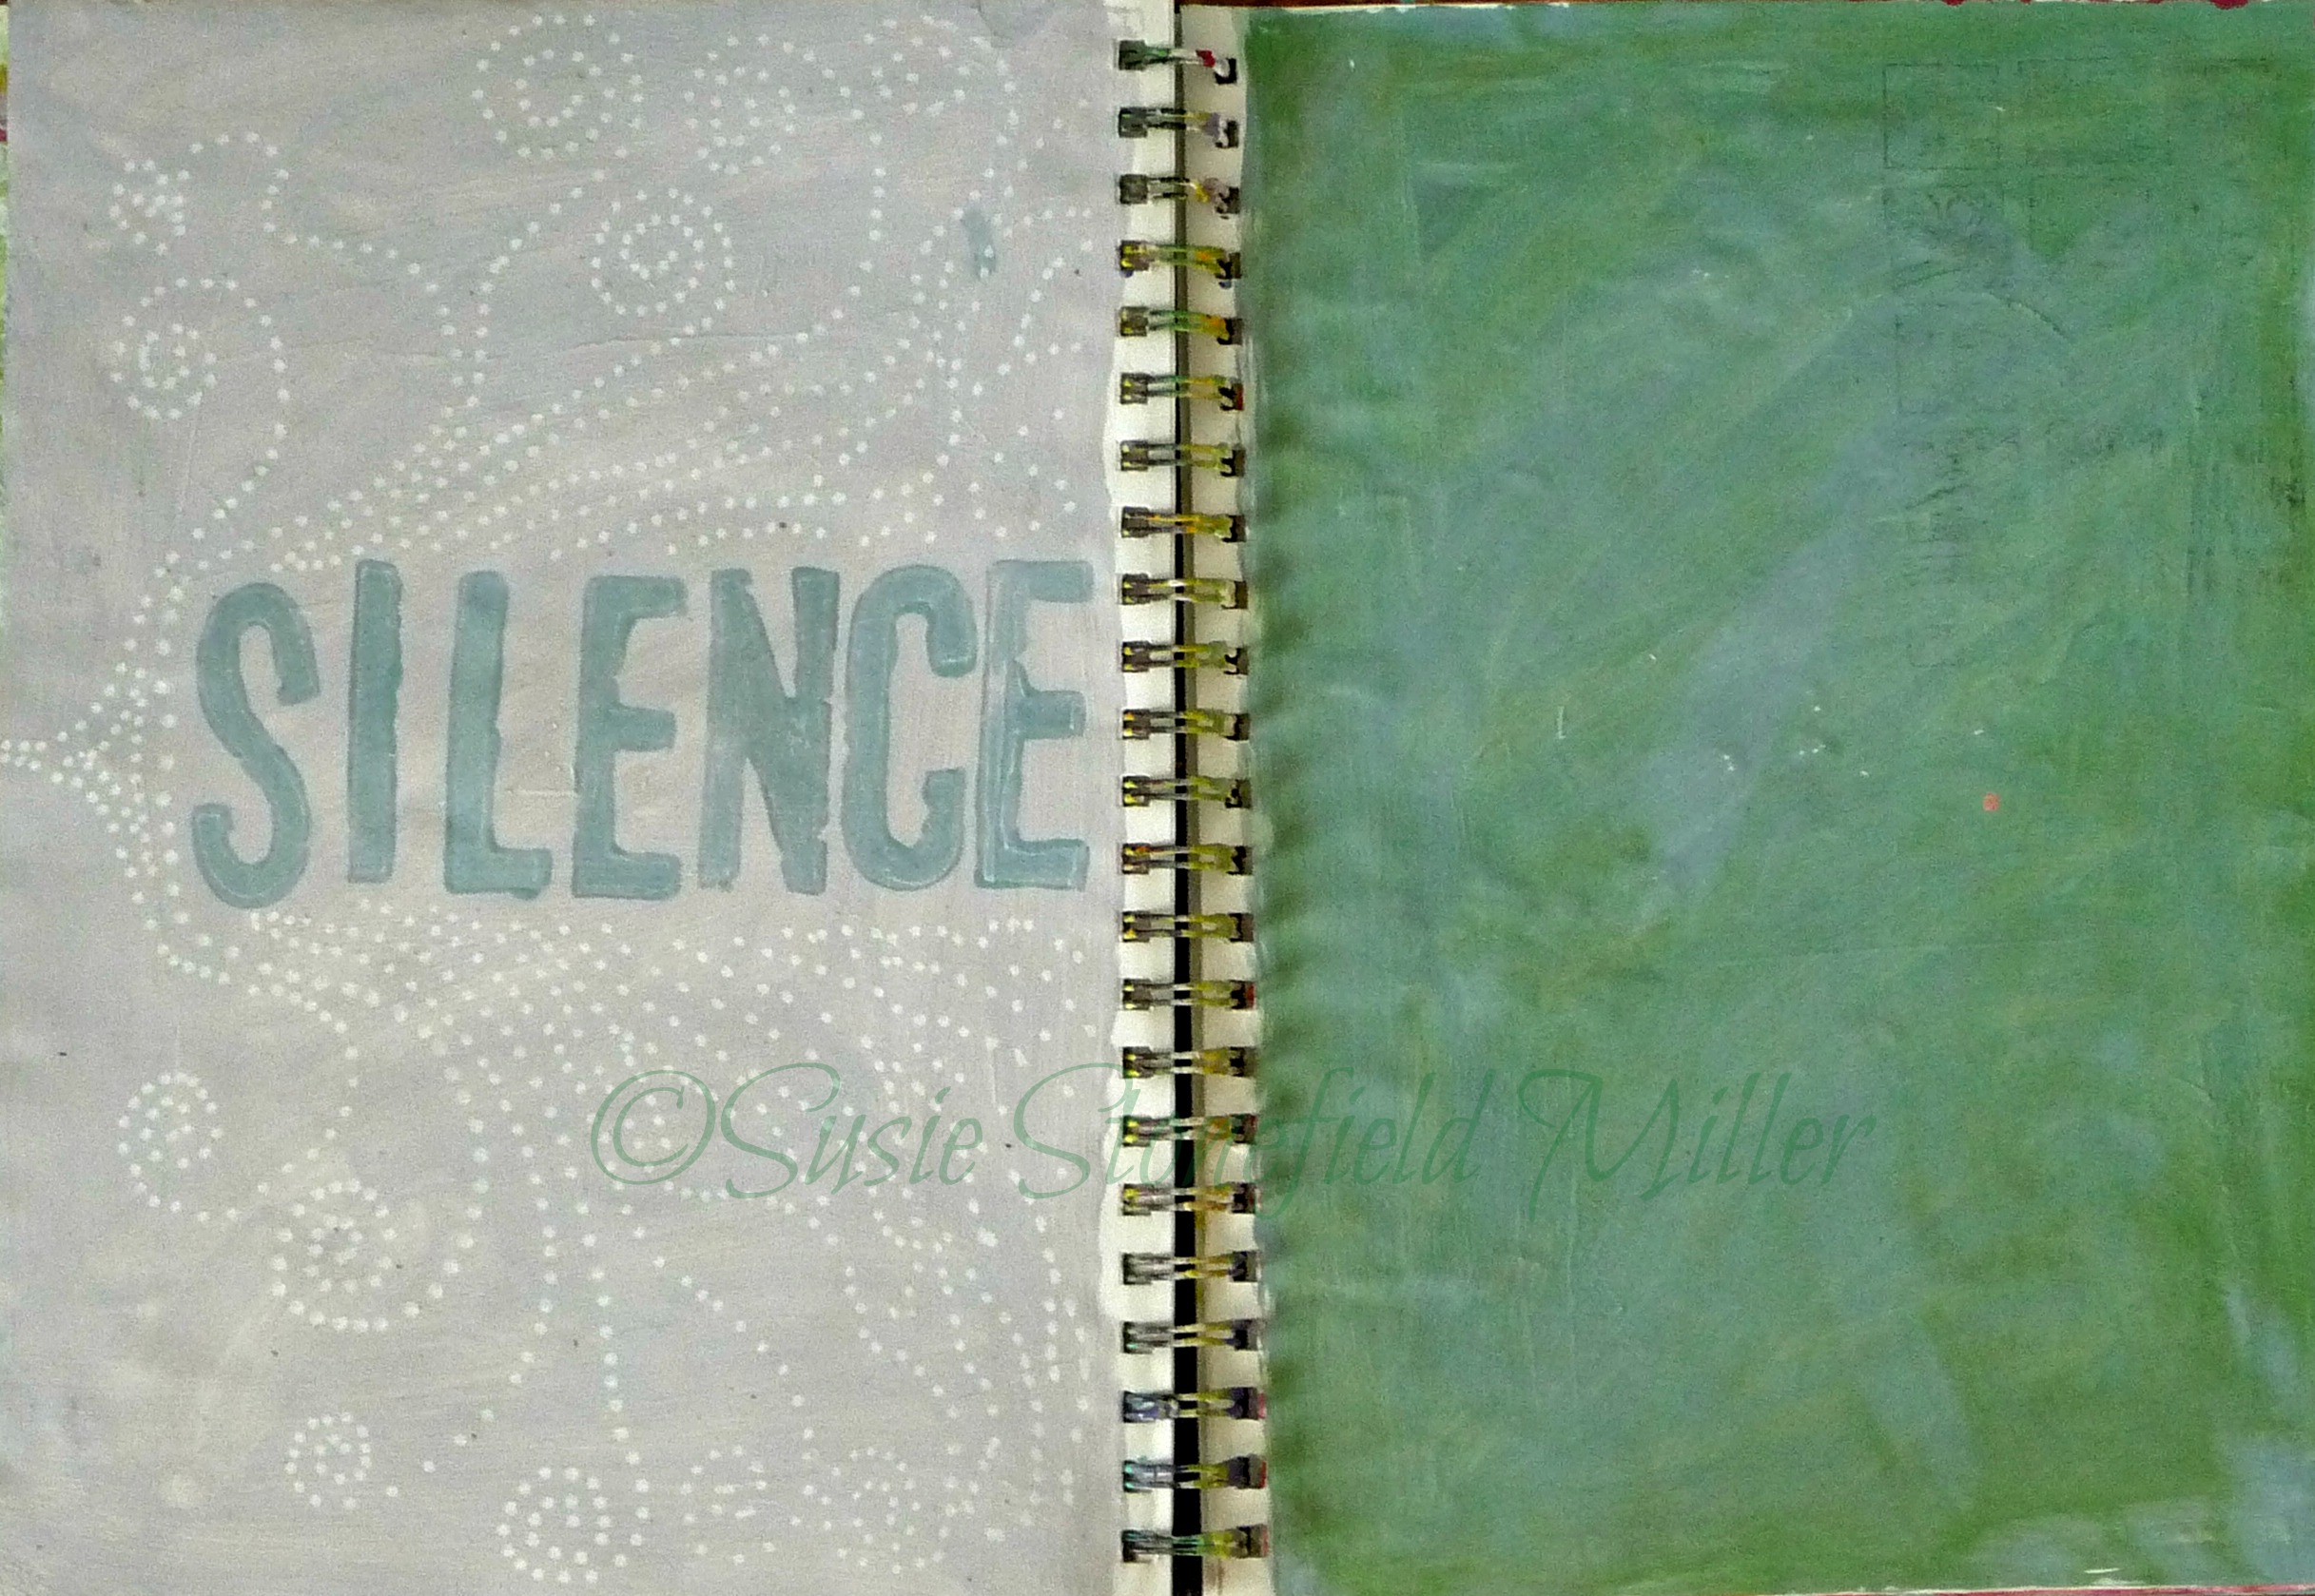 silence wm.jpg